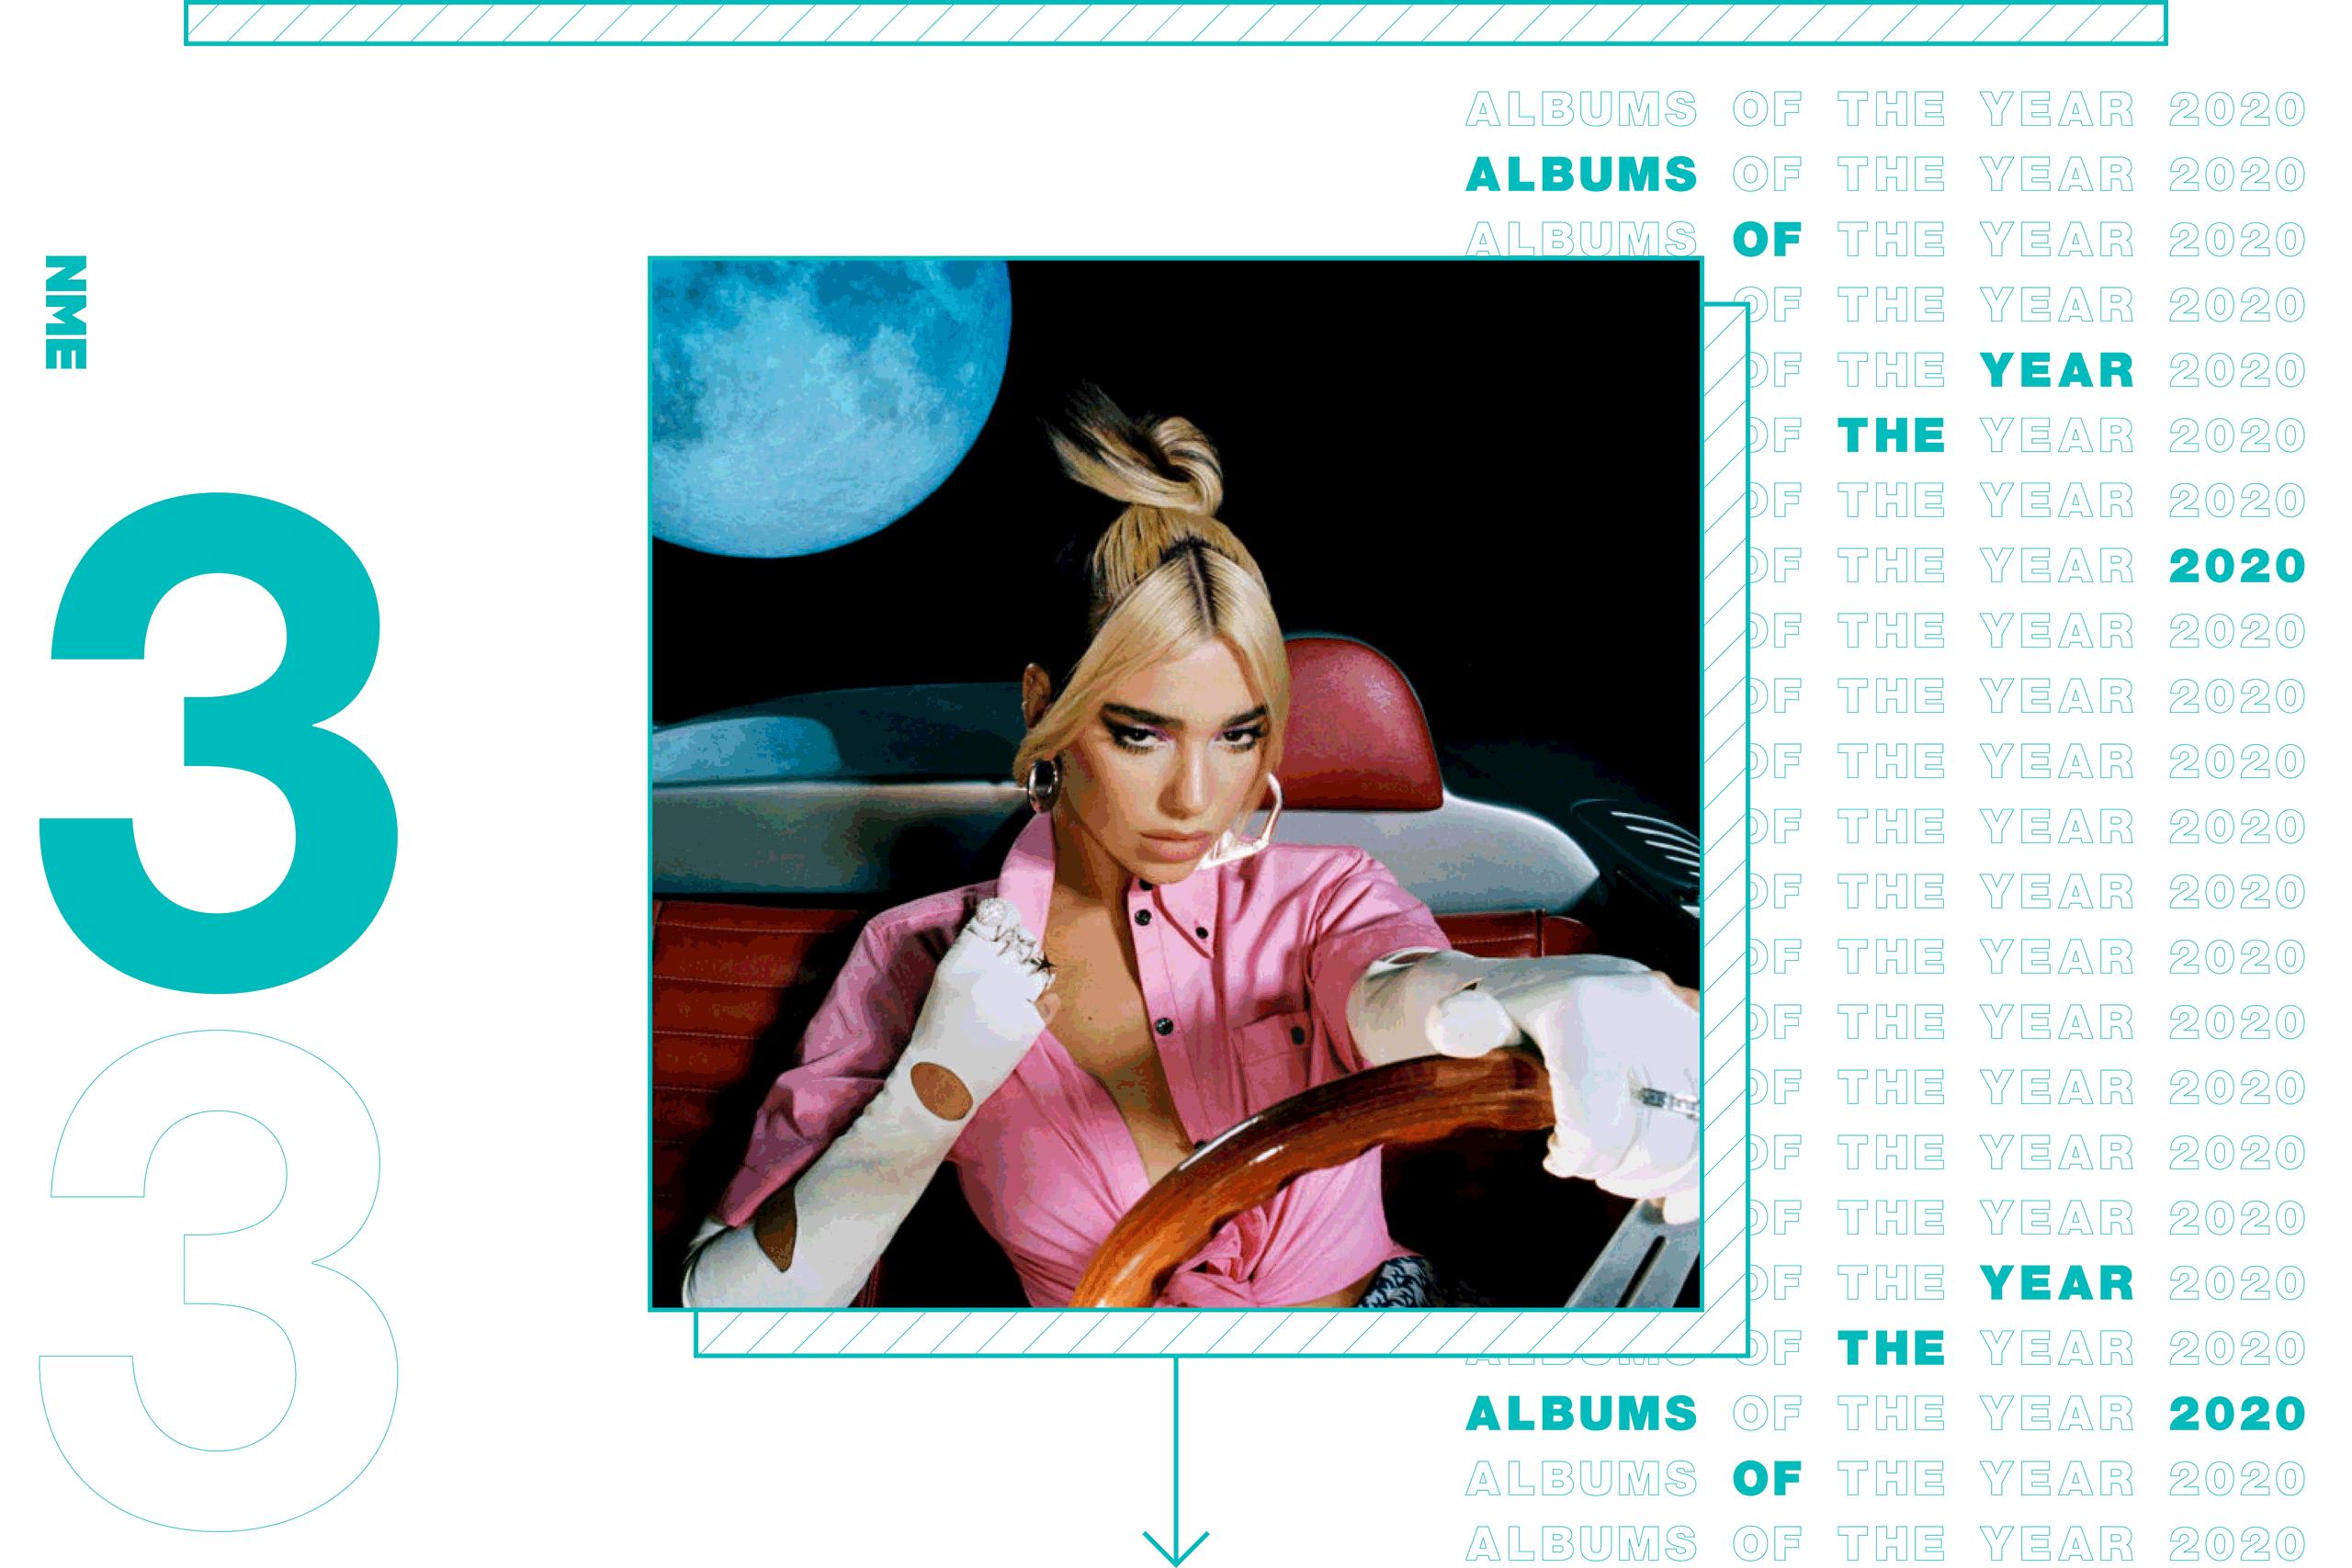 NME Album Of The Year 2020 Dua Lipa, 'Future Nostalgia'